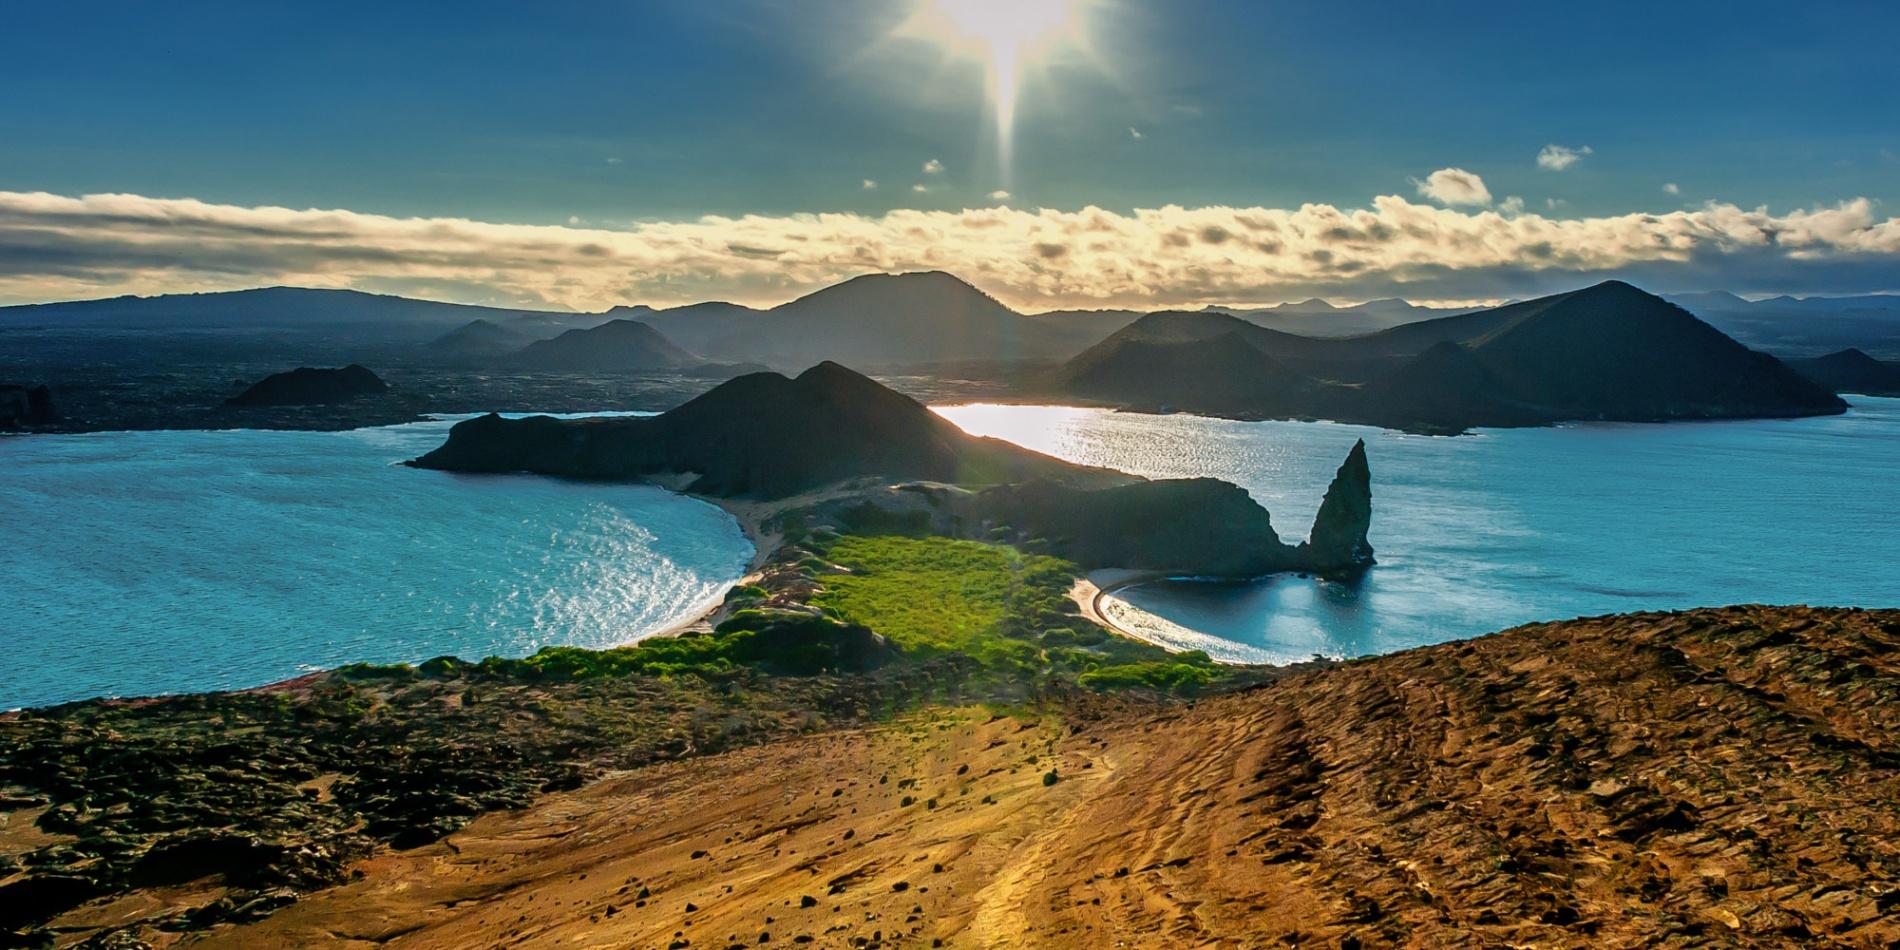 Allowed towards The Galápagos Destinations